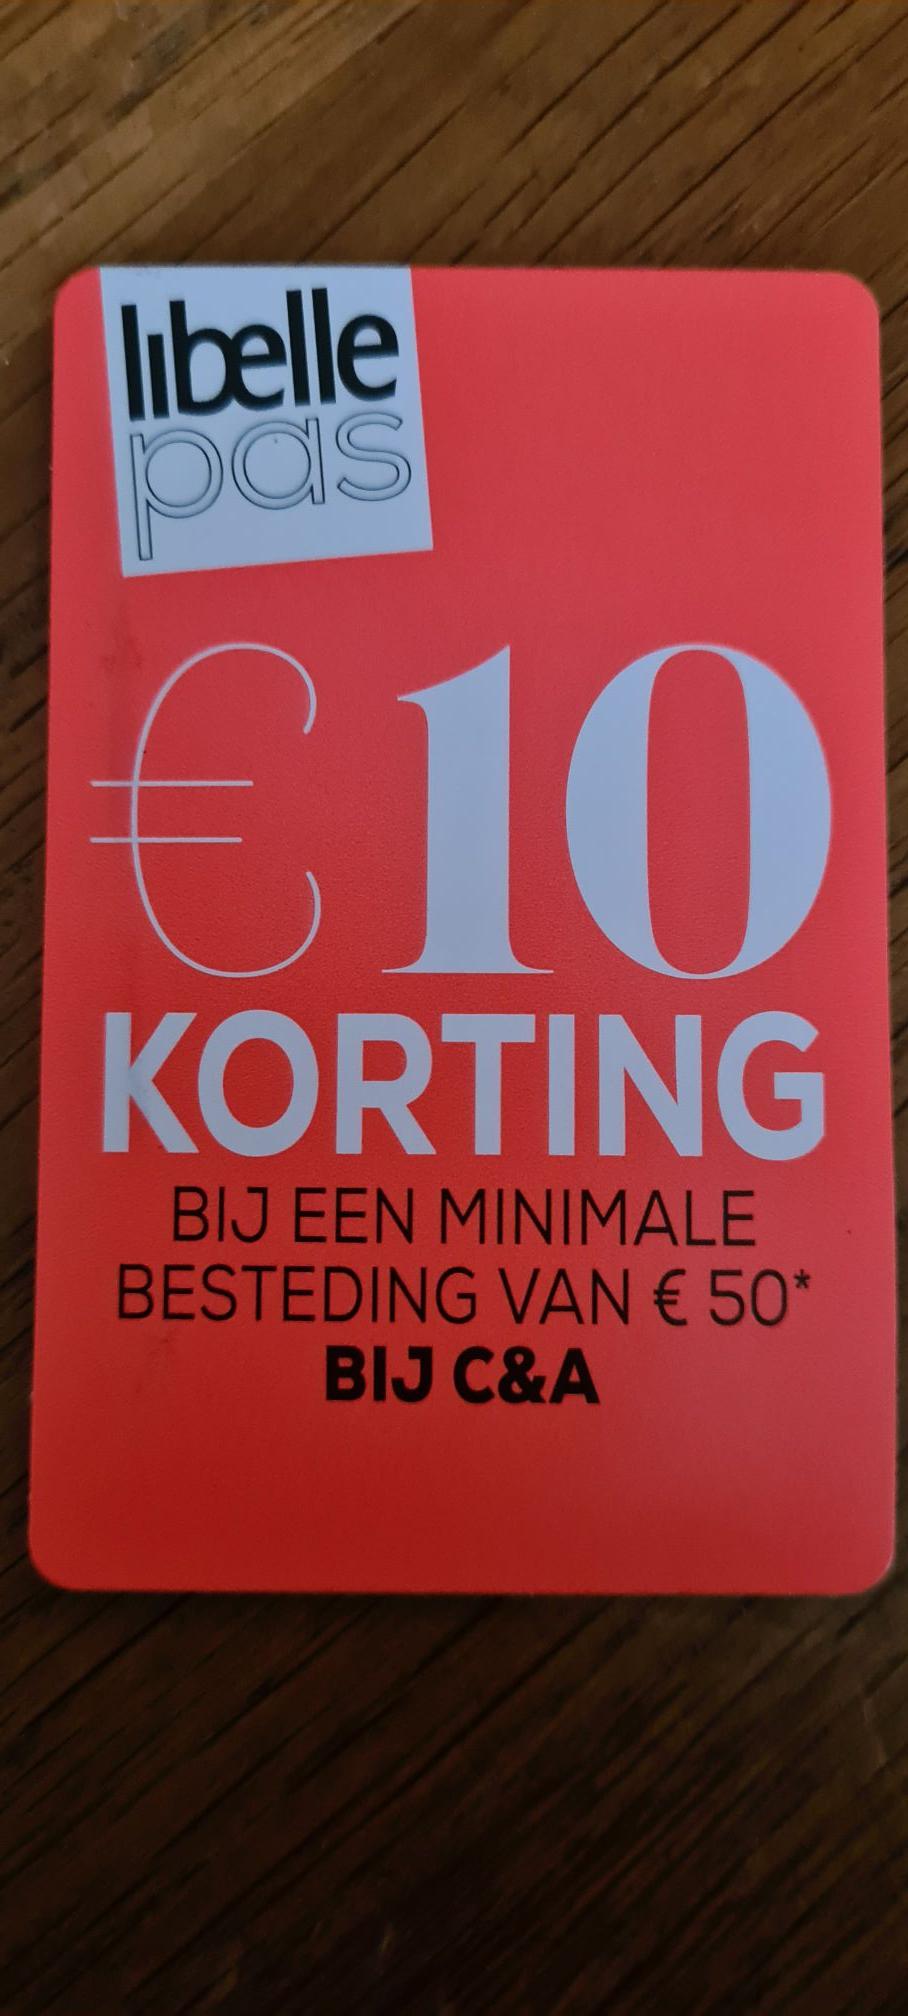 10 euro korting C&A bij besteding van 50 euro.